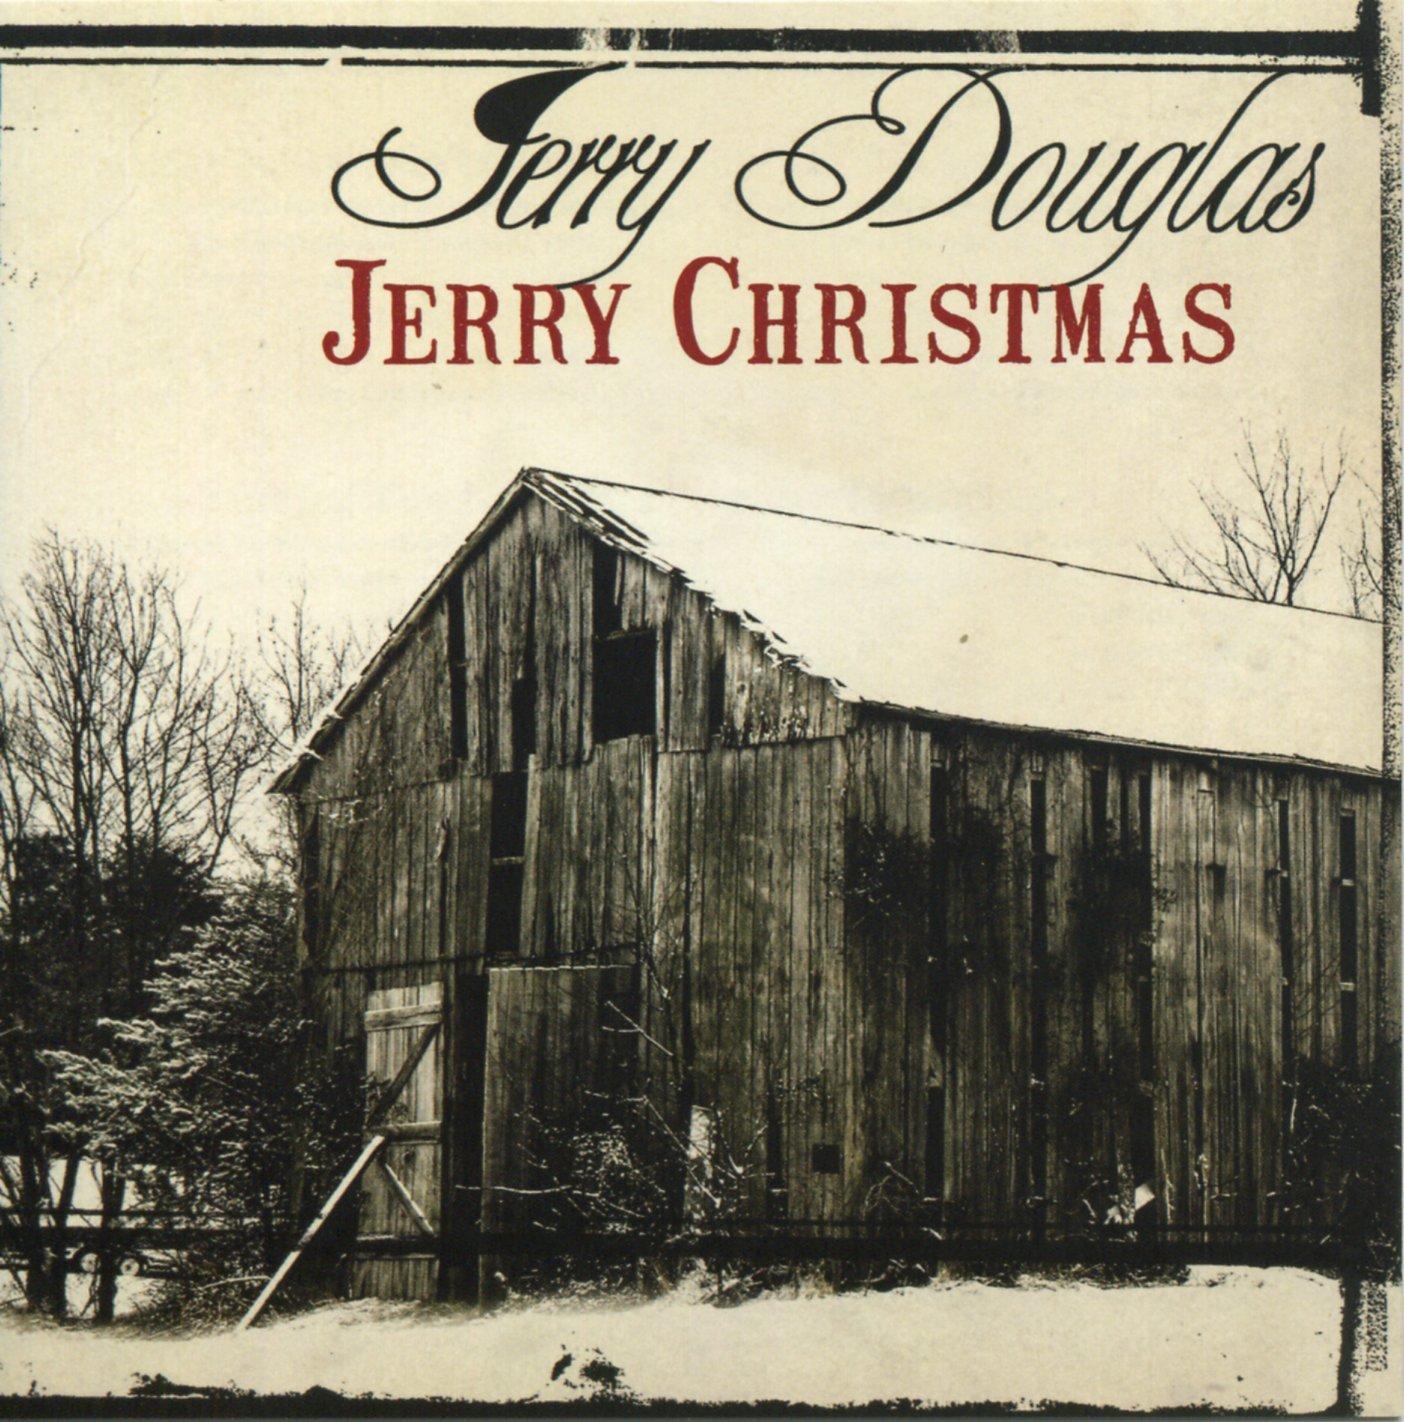 Jerry Douglas - Jerry Christmas - Amazon.com Music